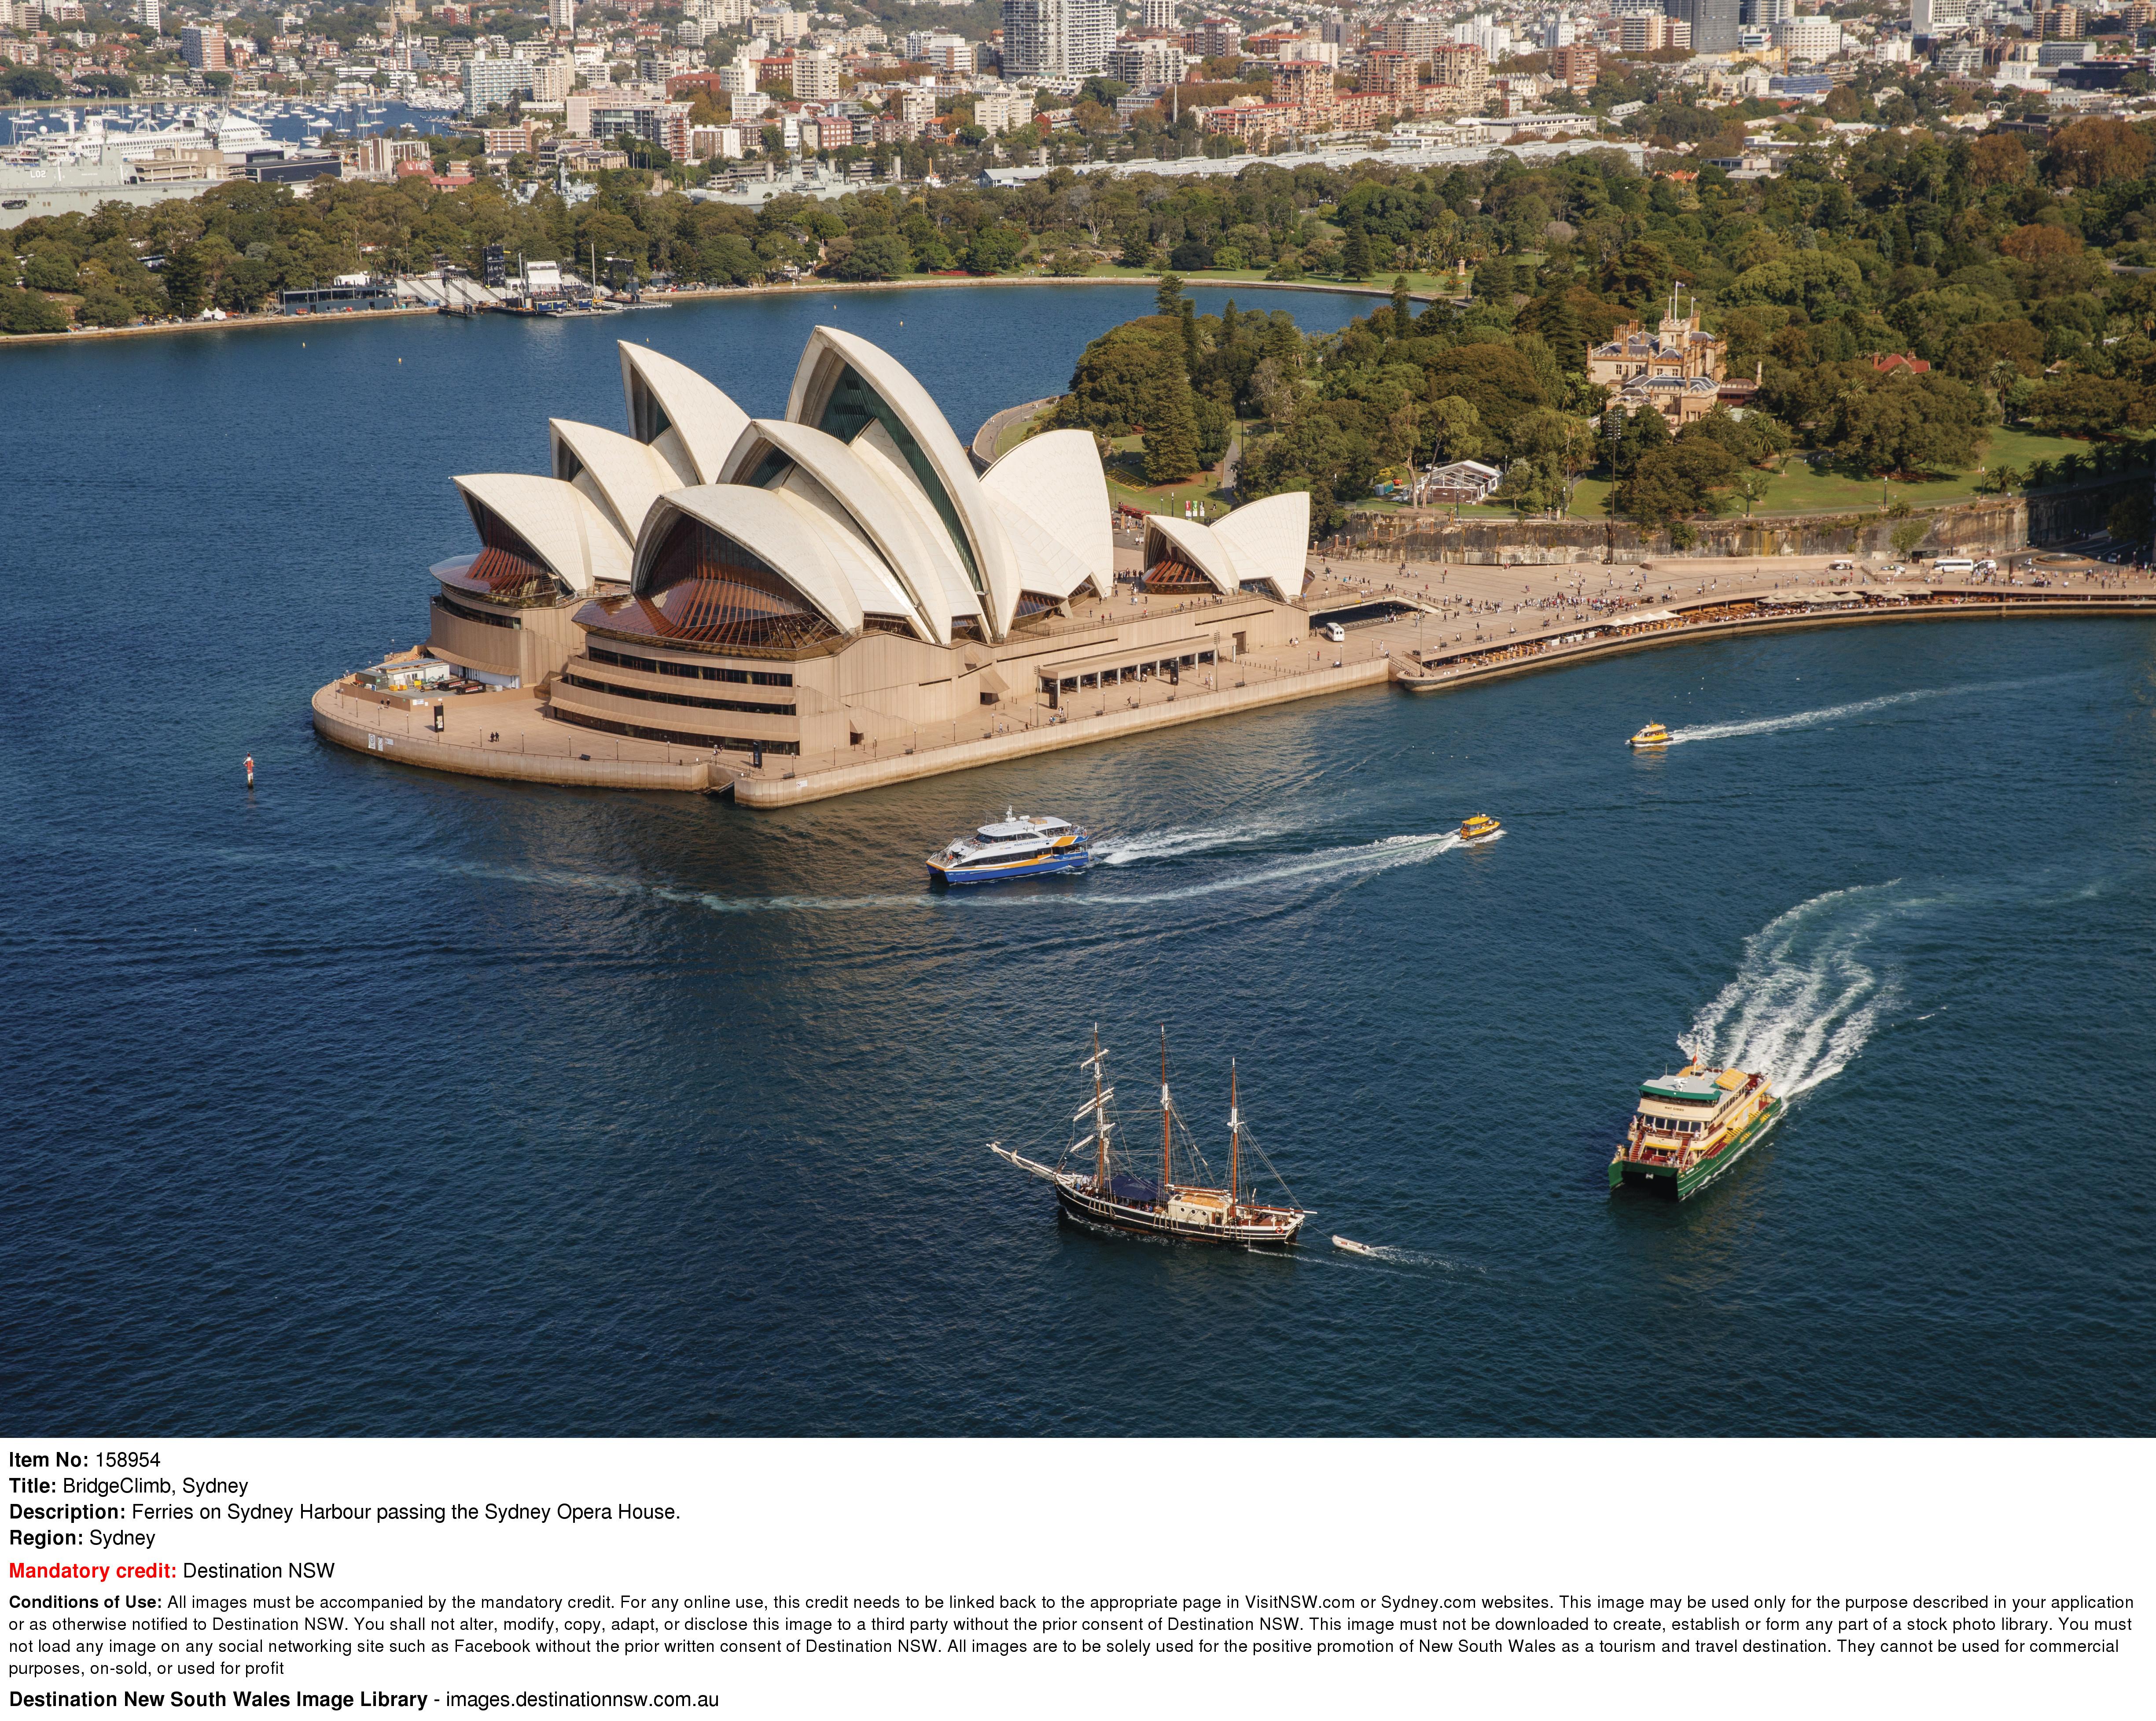 【SYDNEY OPERA HOUSE】帶你了解構造和歷史 | 悉尼自由行套票4-31天